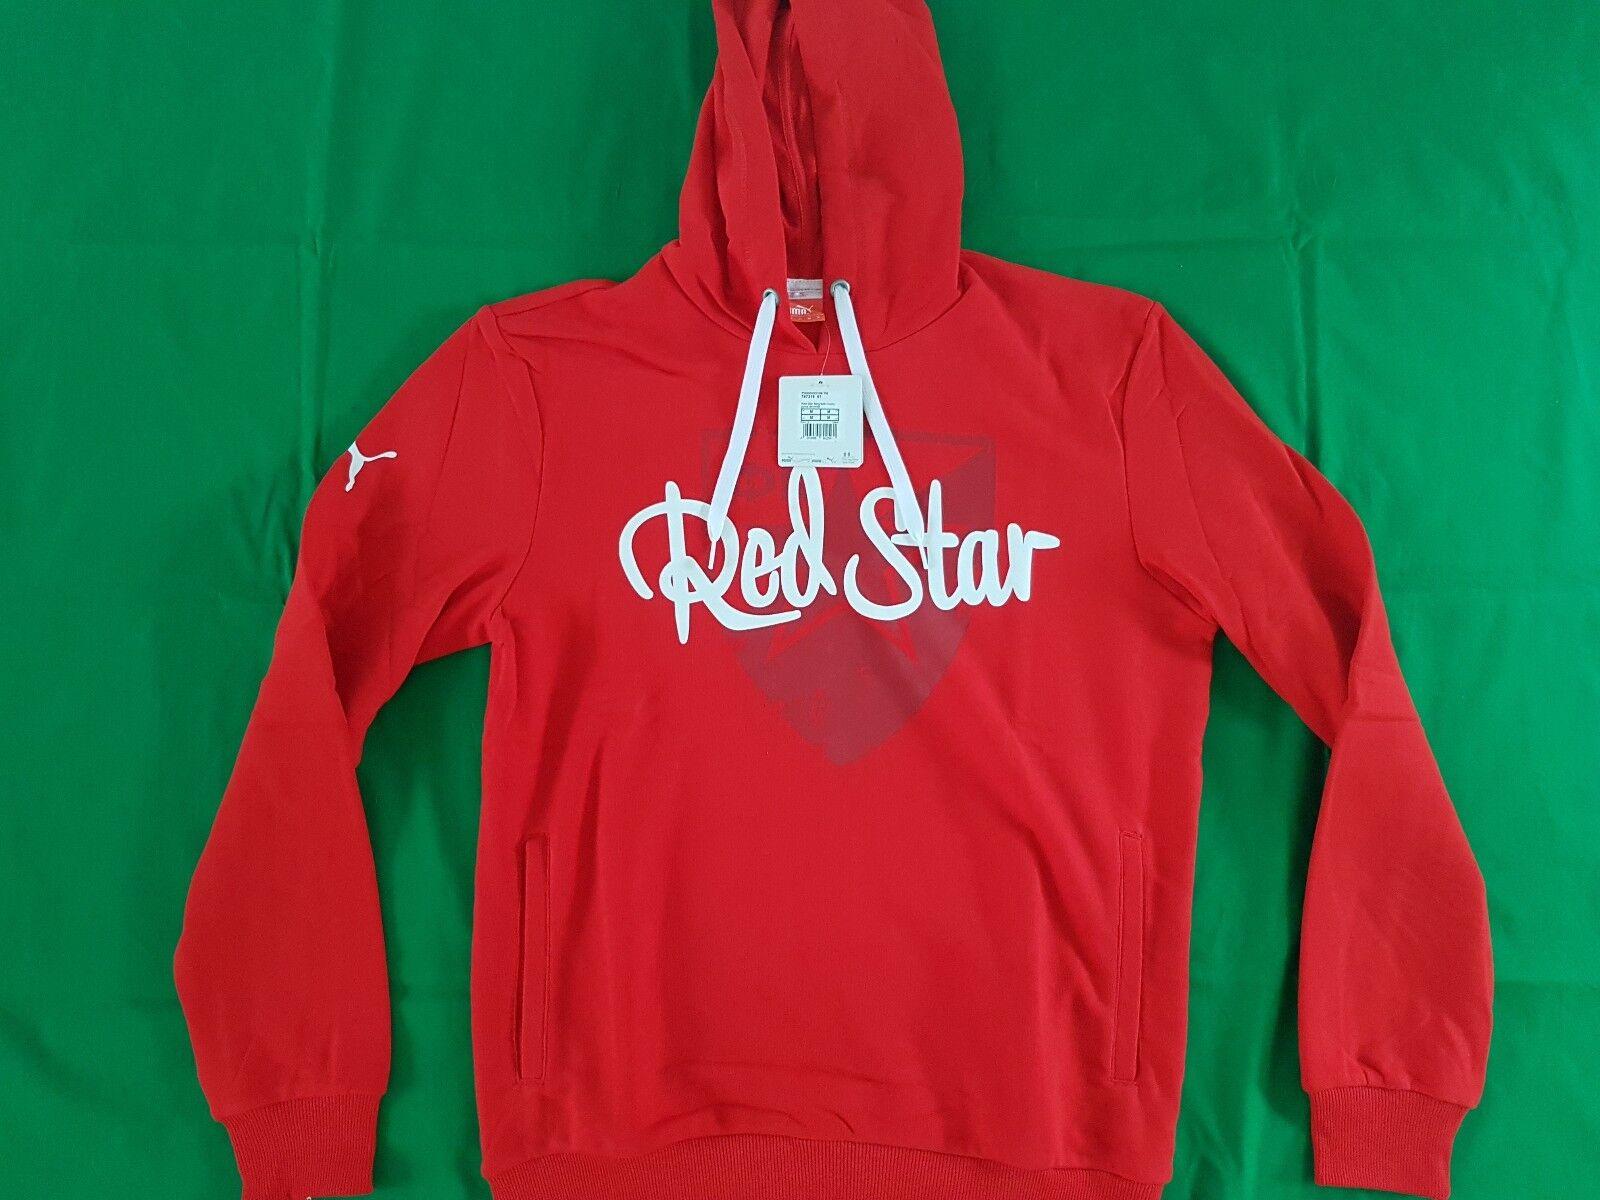 Roter Stern Belgrad Hoodie 2015/16 Puma Gr S M XL -NEU- Crvena Zvezda Pullover